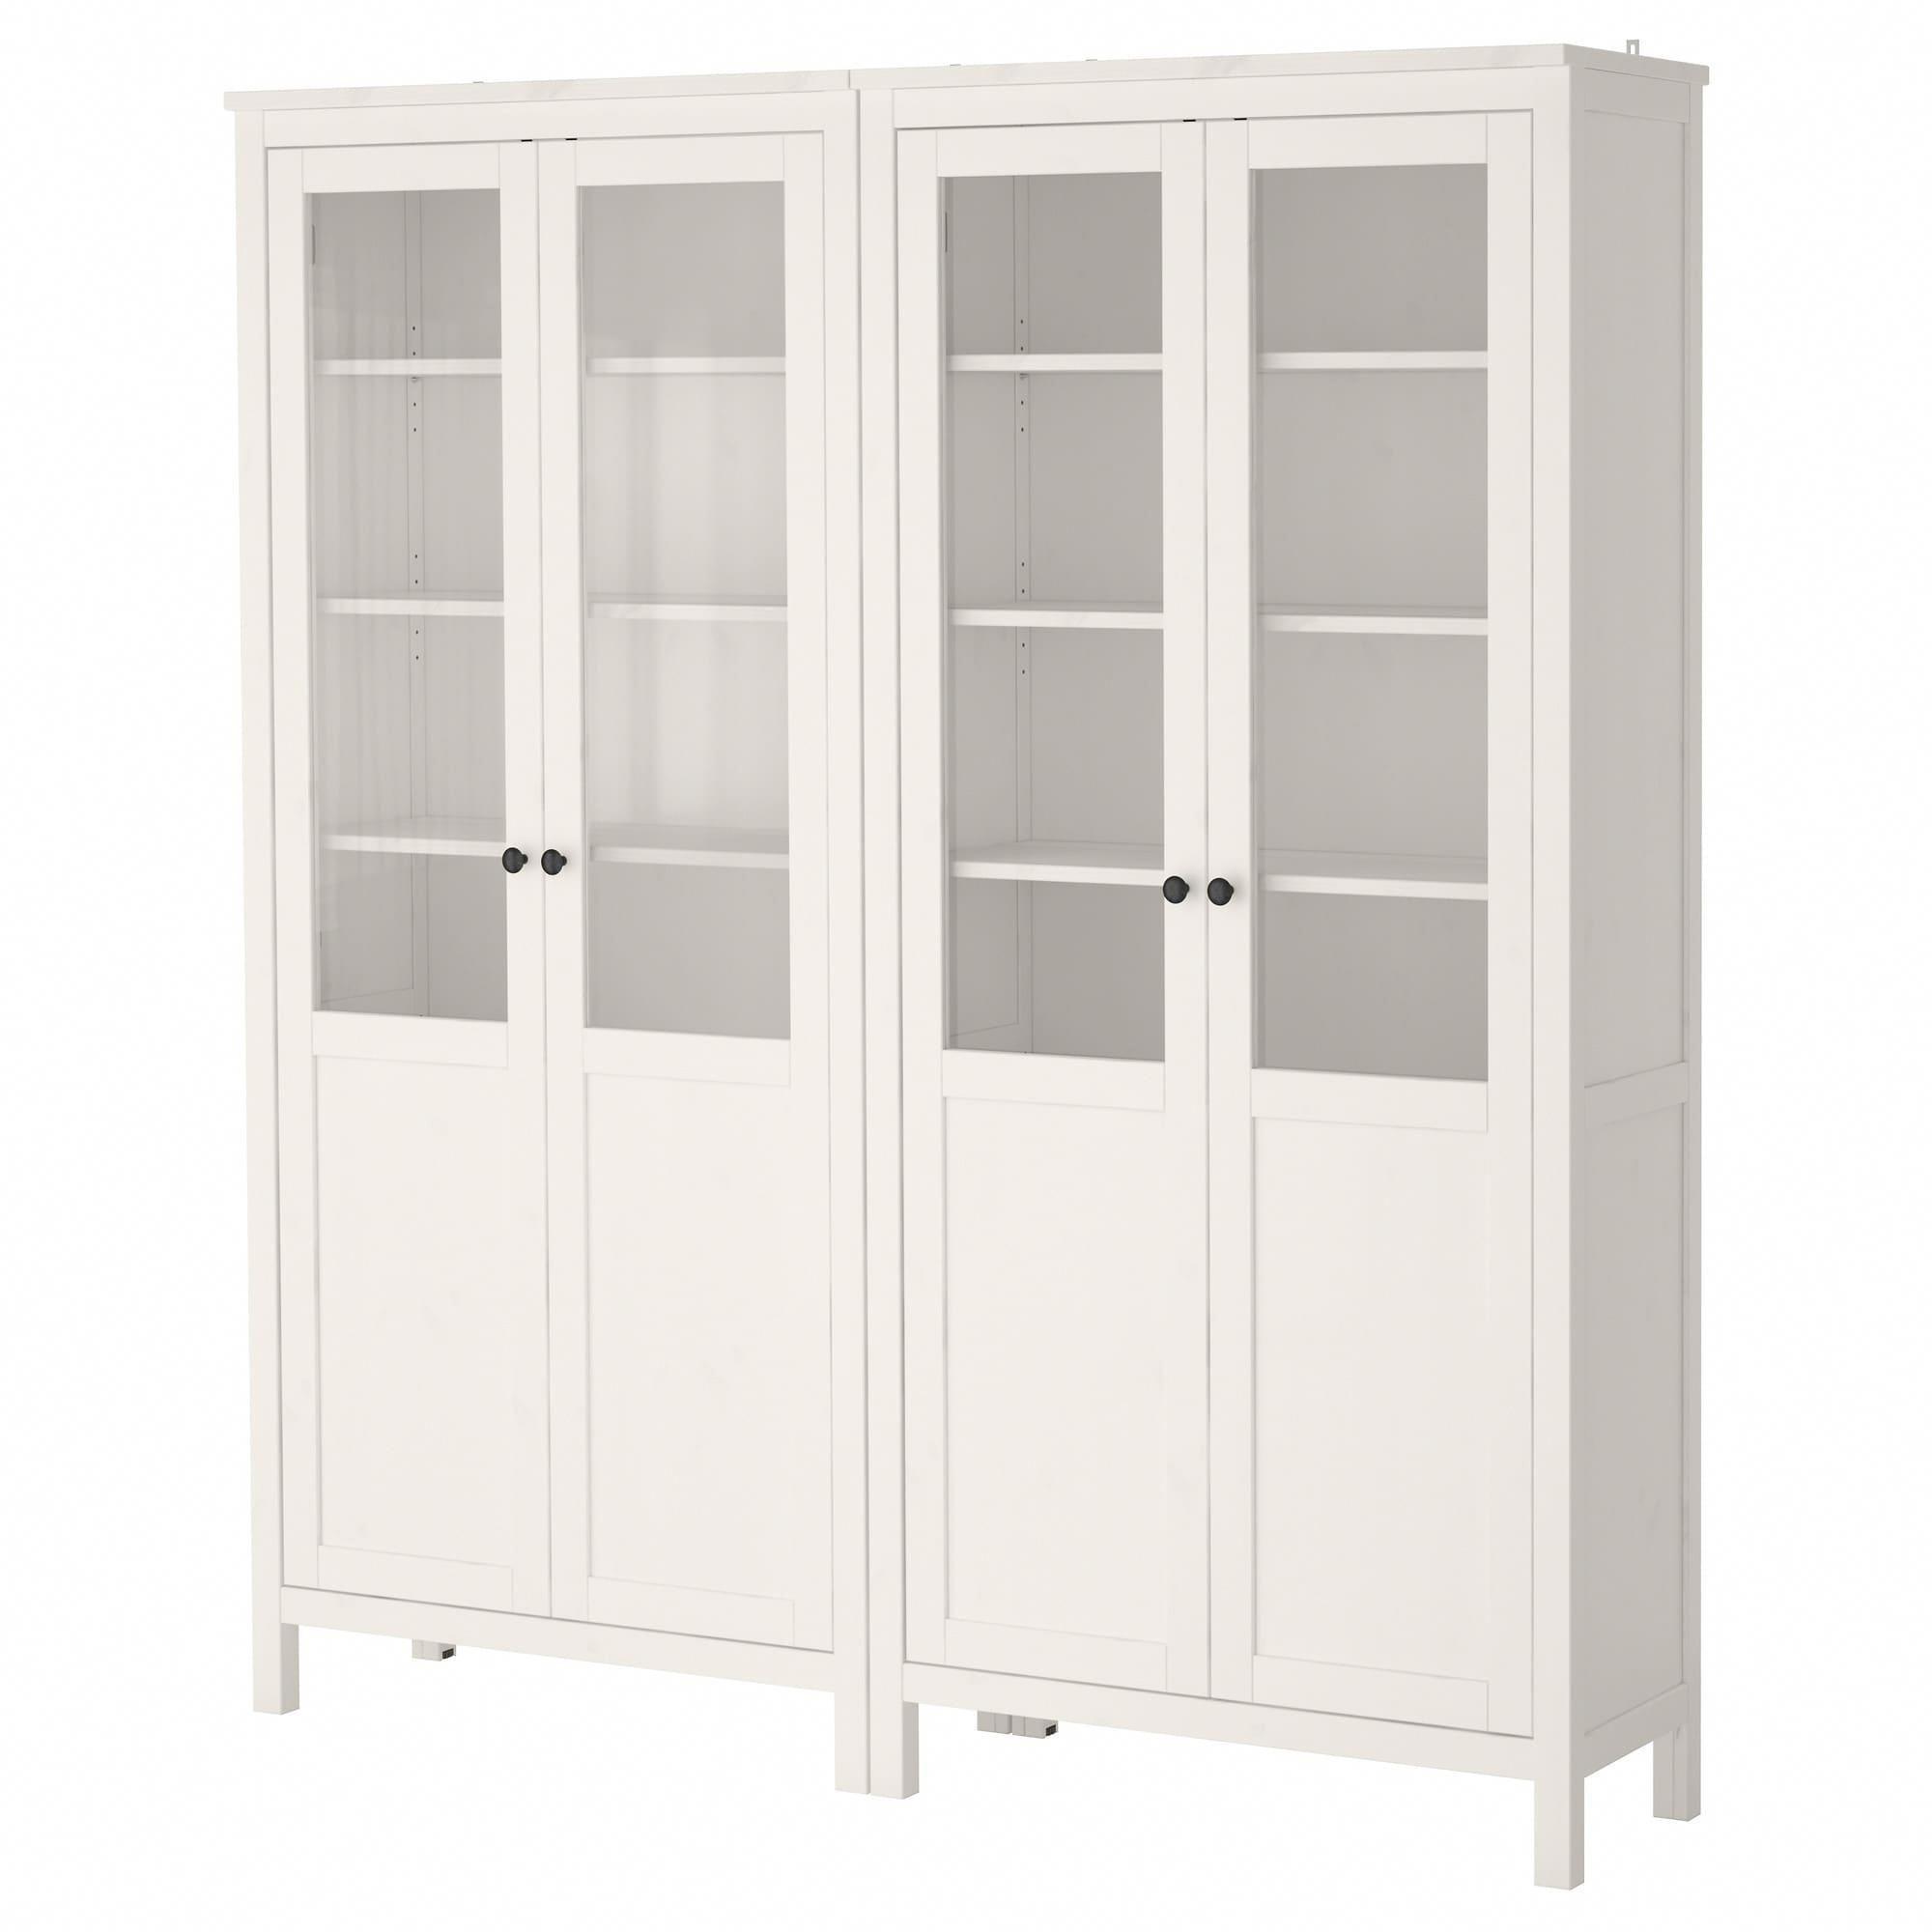 Ikea Hemnes Storage Combination W Gl Doors White Stain